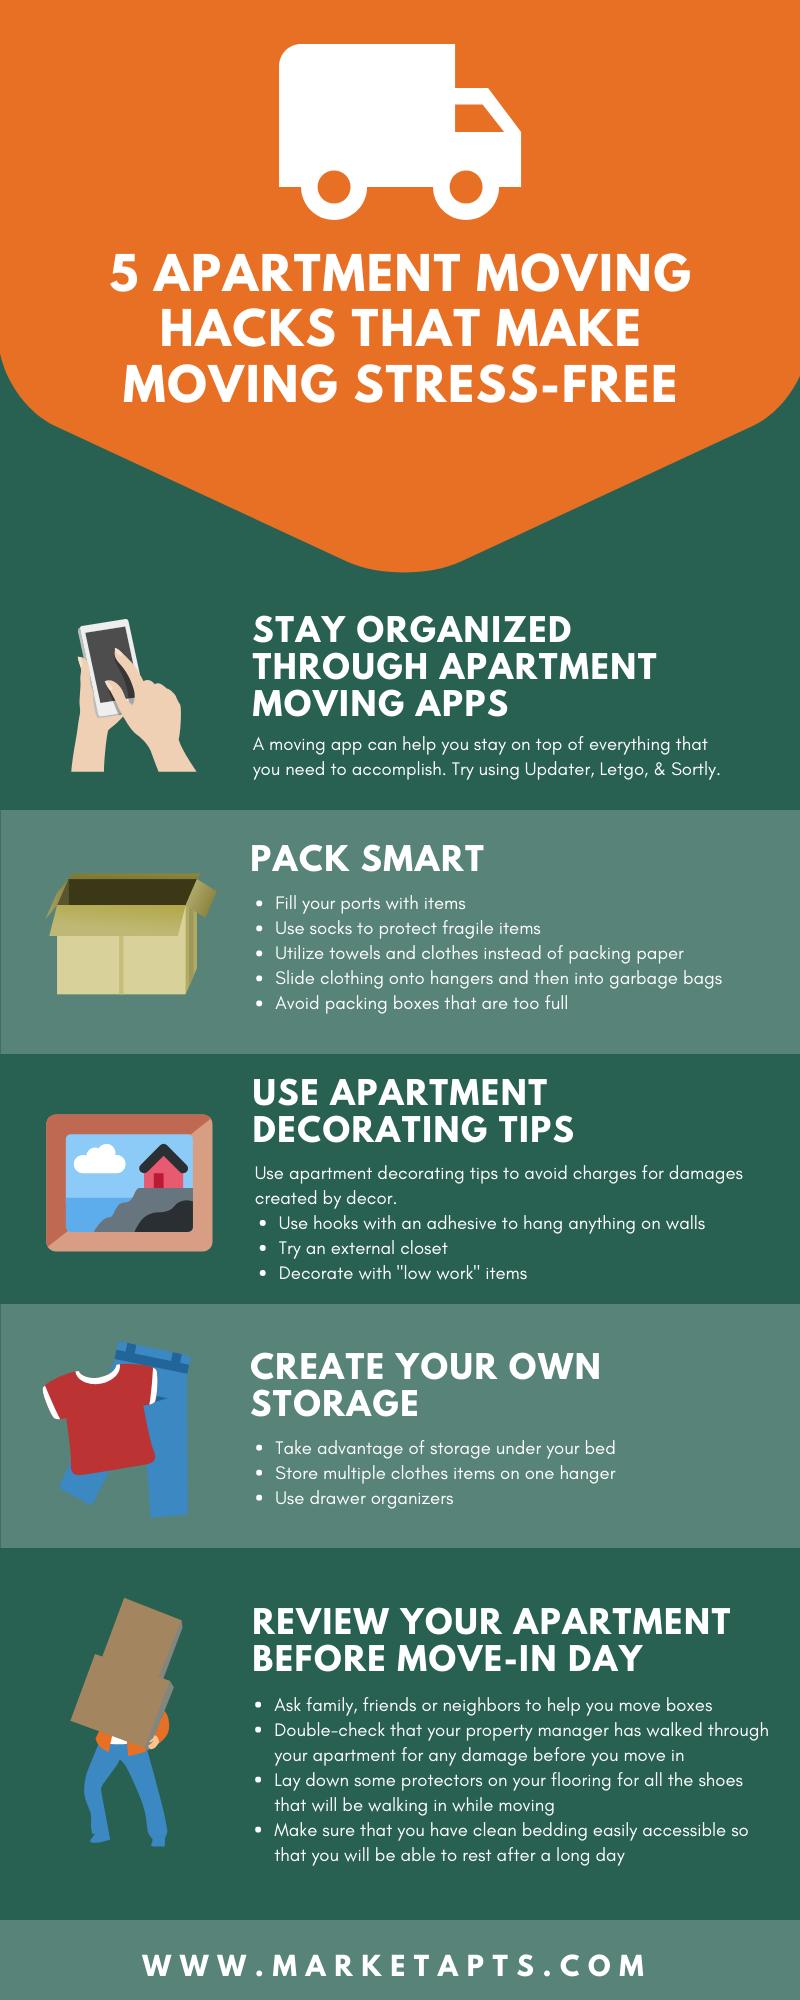 Top 5 Apartment Moving Hacks That Make Moving Stress-Free ...